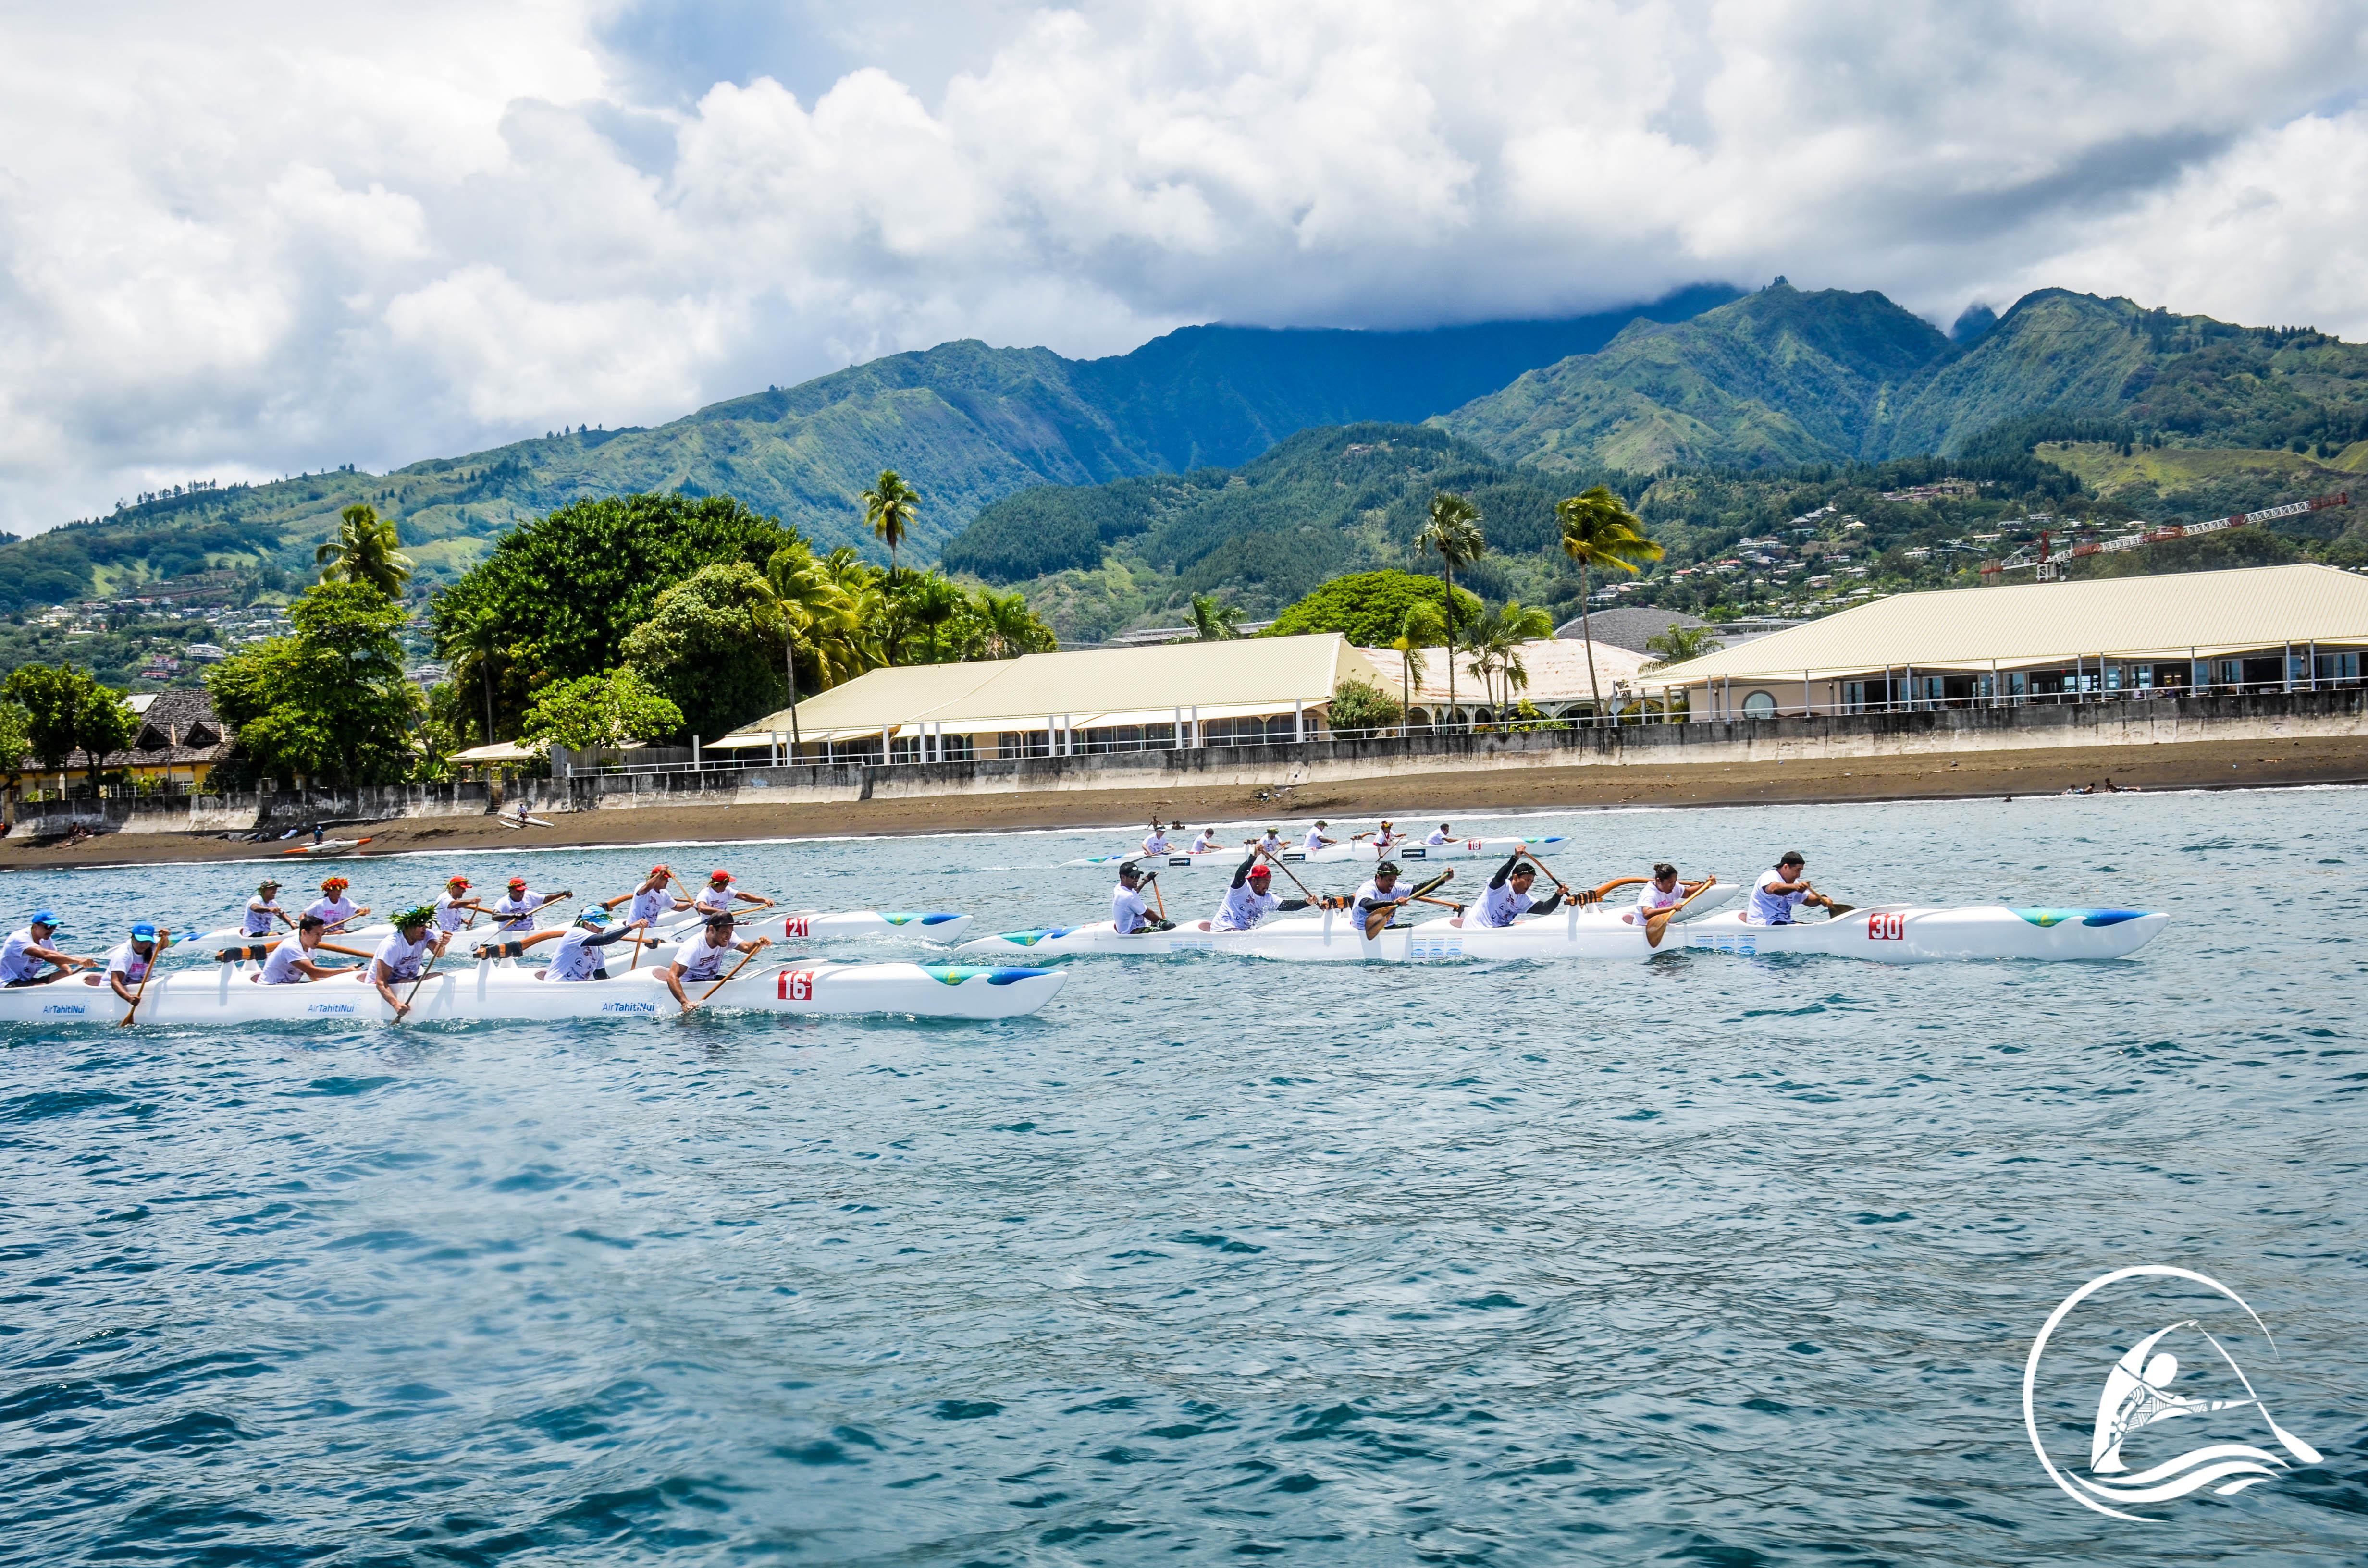 Interdiction de naviguer pendant les compétitions de Va'a dans la Baie de Taaone